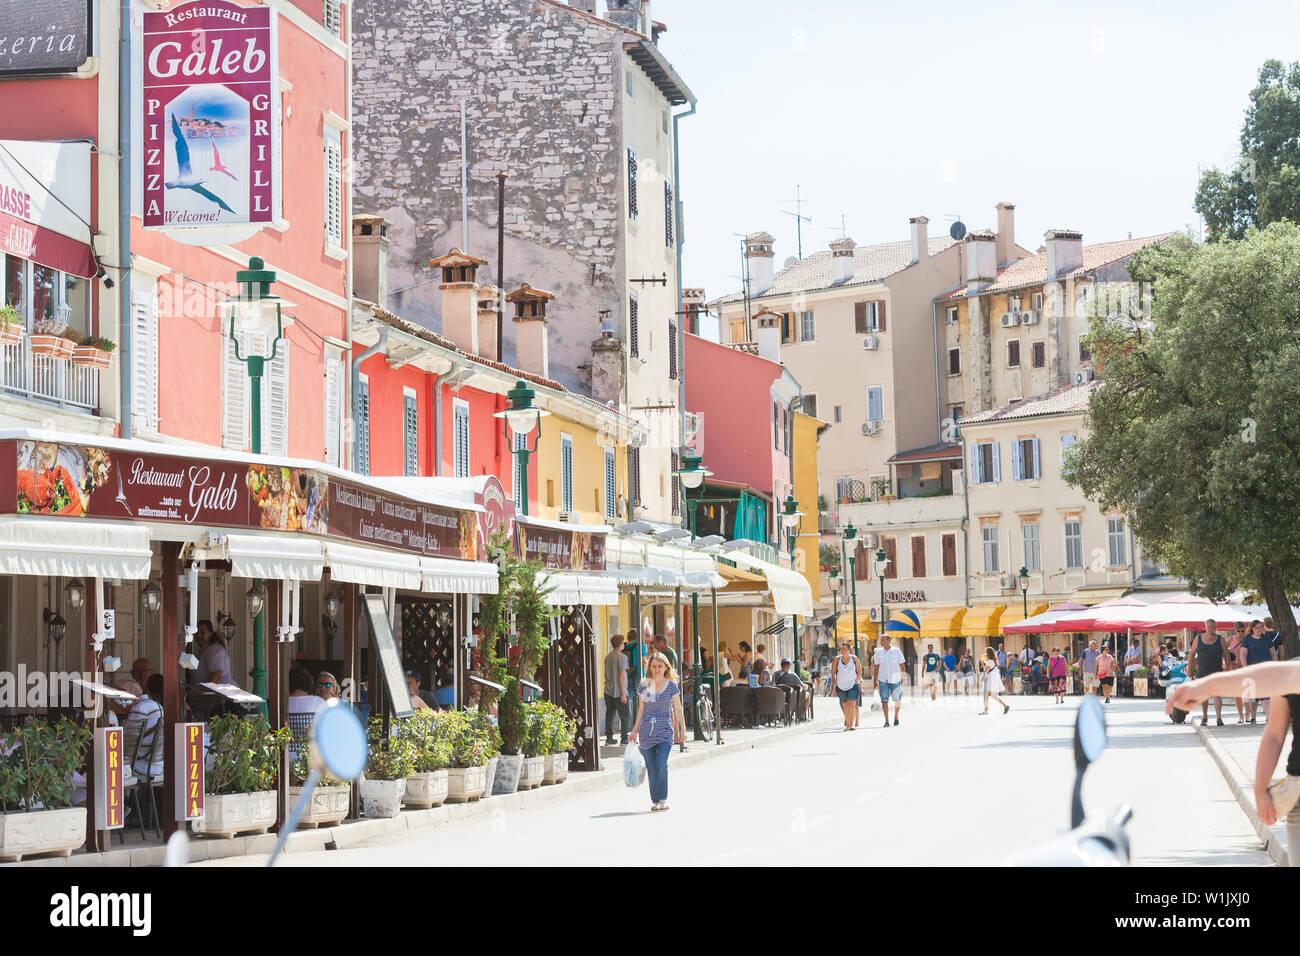 Rovinj, Kroatien, Europa - September 2, 2017 - Touristen in den Gassen von Rovinj Stockfoto